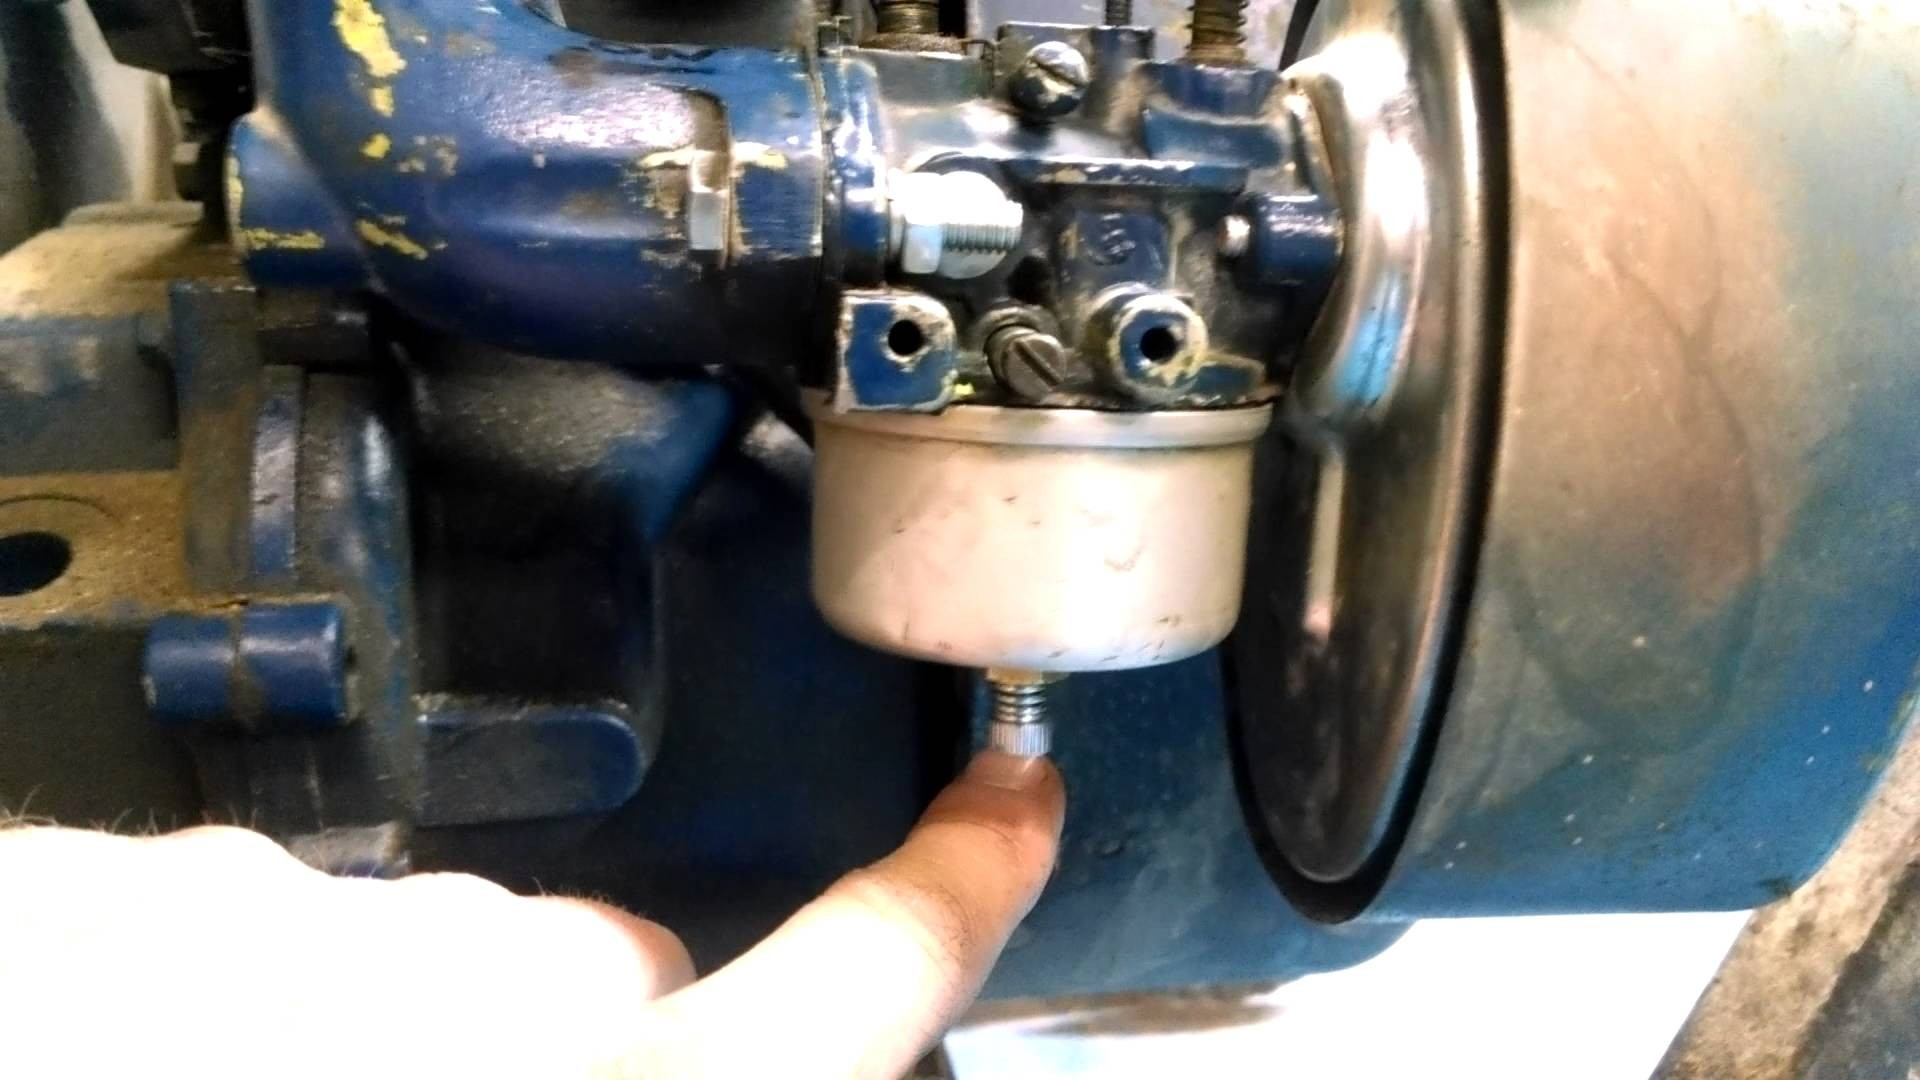 hight resolution of tecumseh 6 5 hp engine diagram tecumseh 2 5 hp engine my wiring